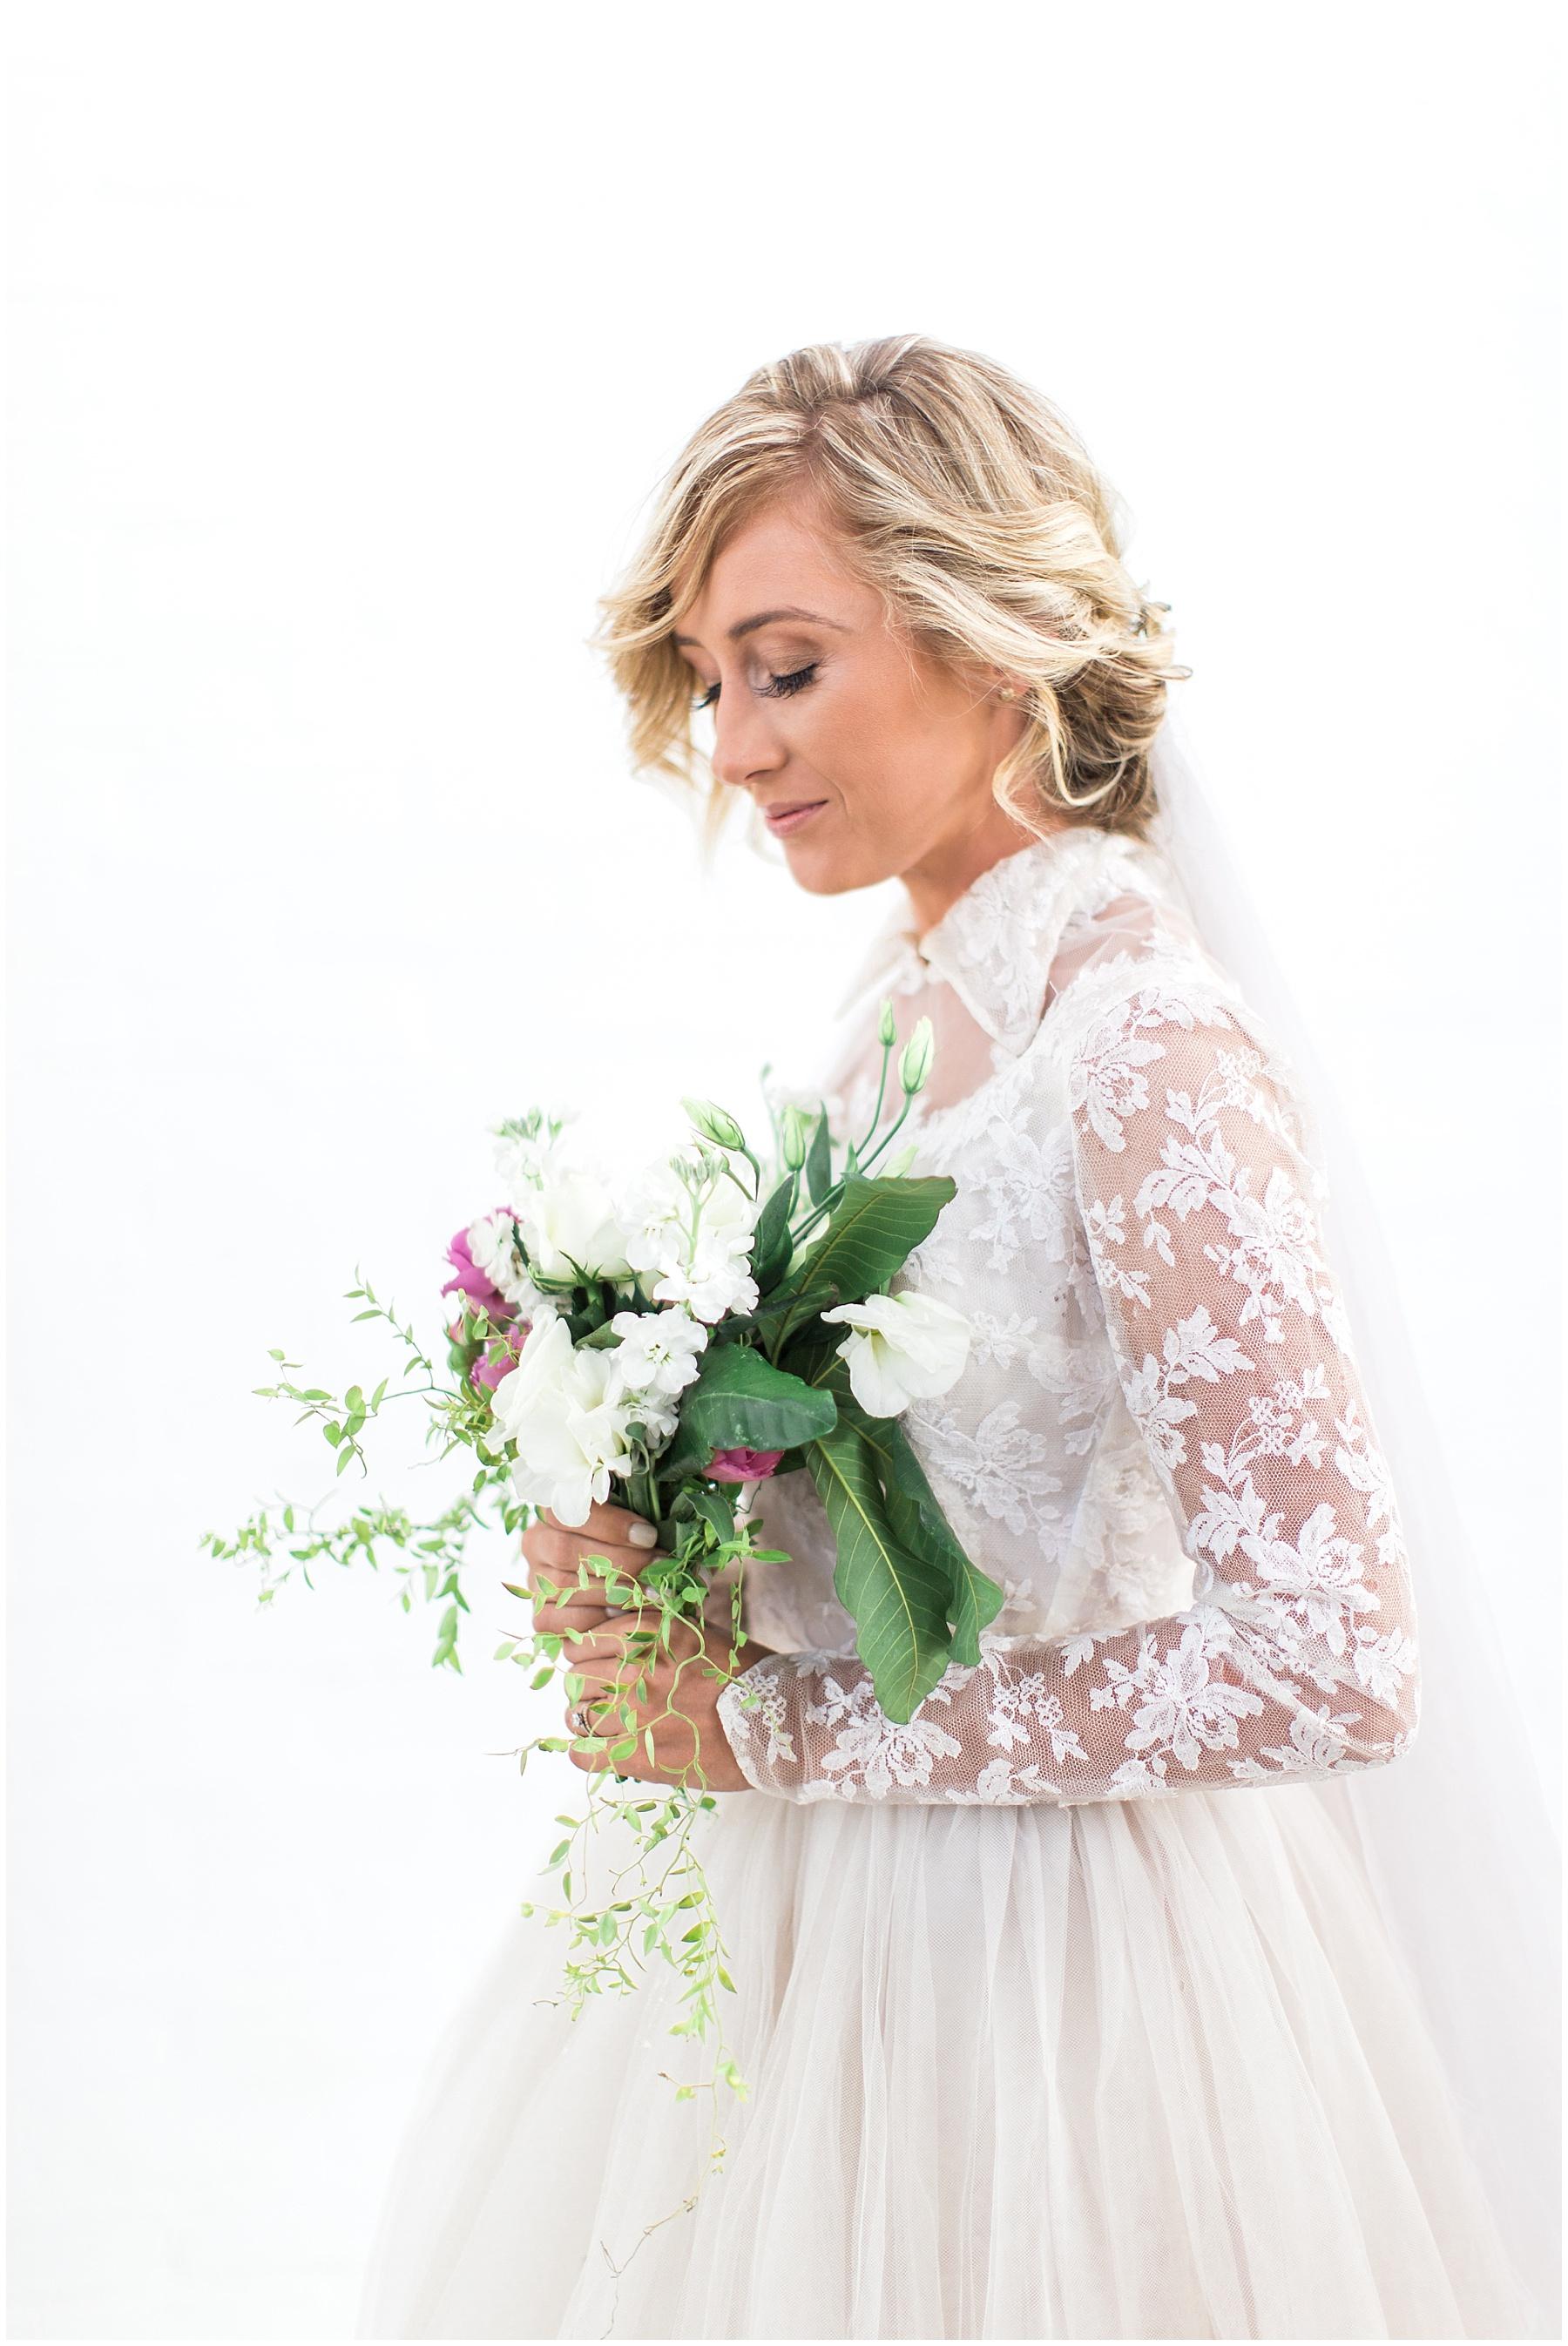 AliciaLandman_JoleneandZander_Wedding_The Pretty Blog_0424.jpg